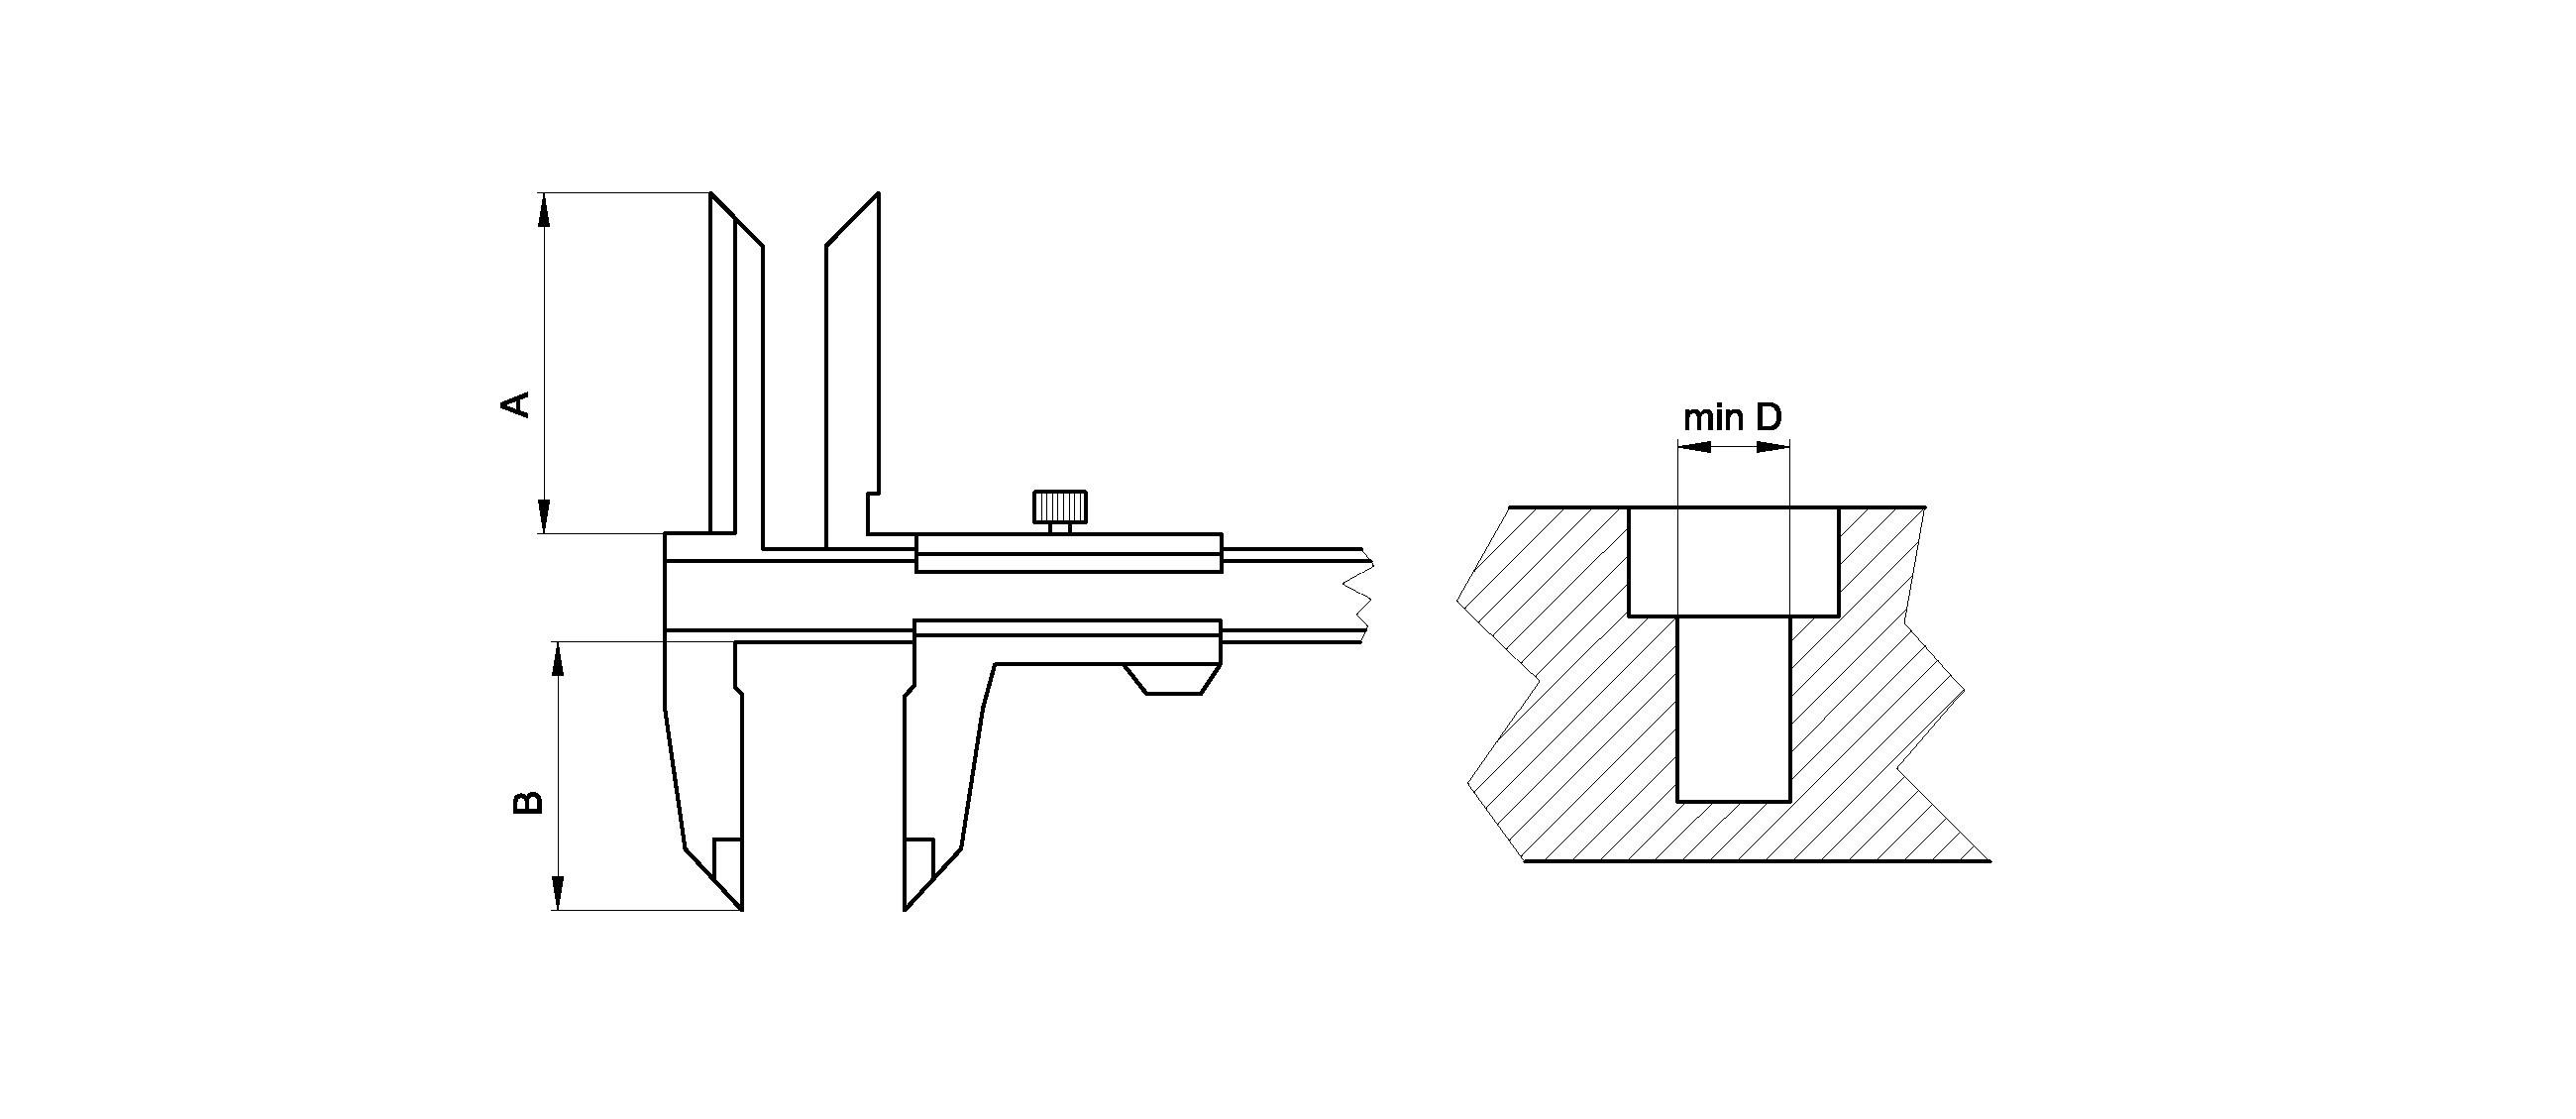 Vernier Caliper With Lengthened Points Ziiu Standart Diagram Model 169